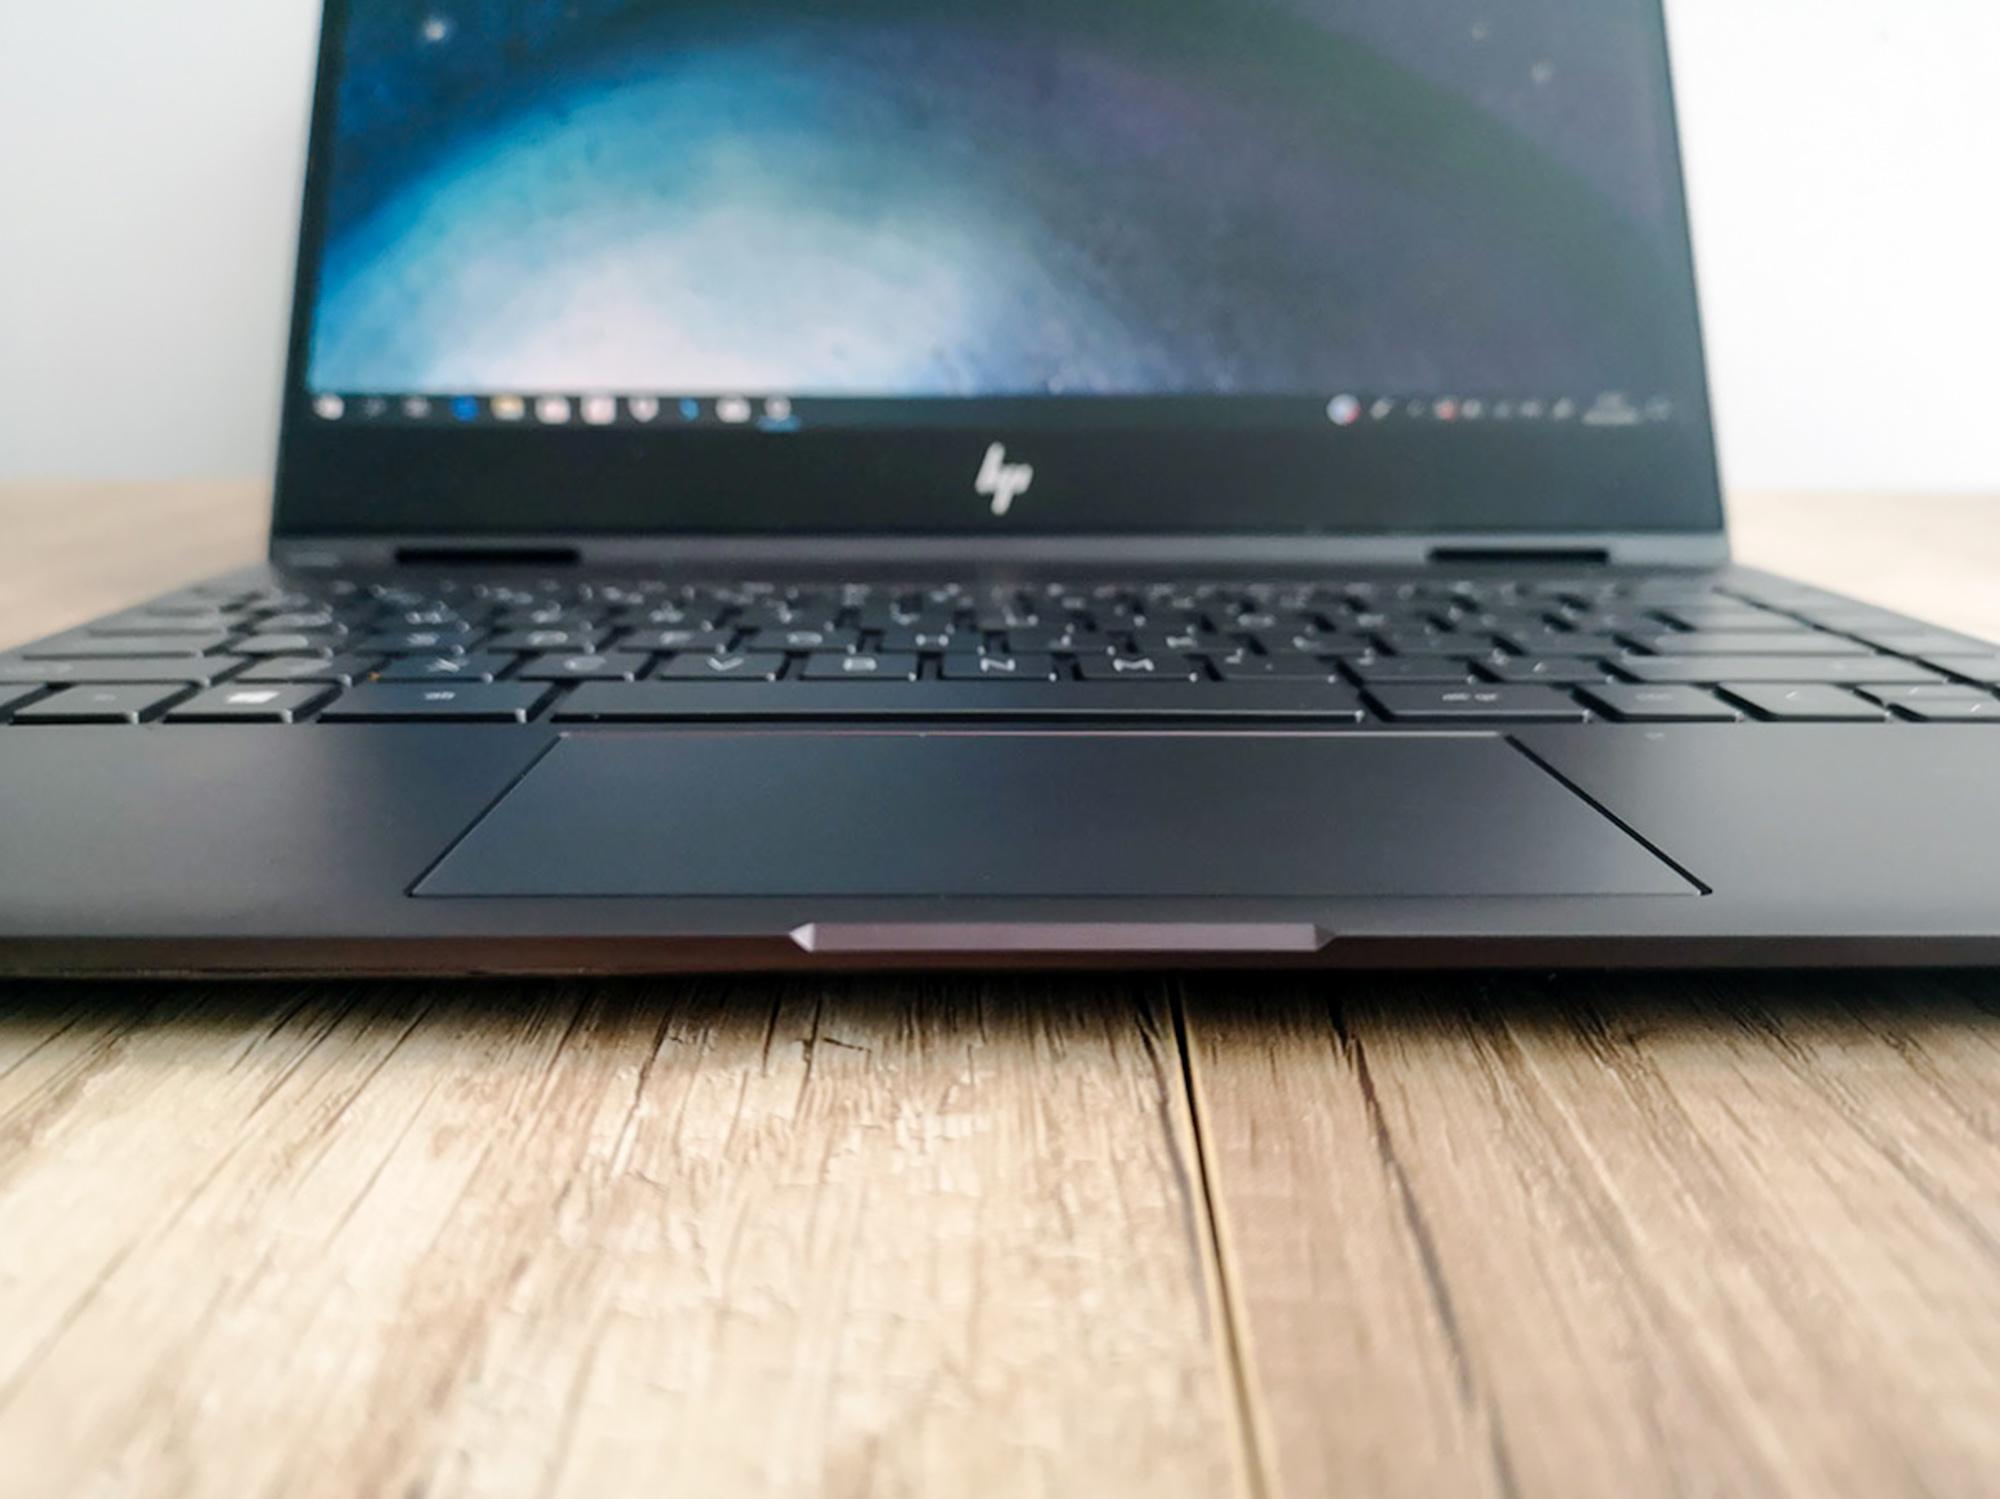 HP Envy x360 13 recenzja